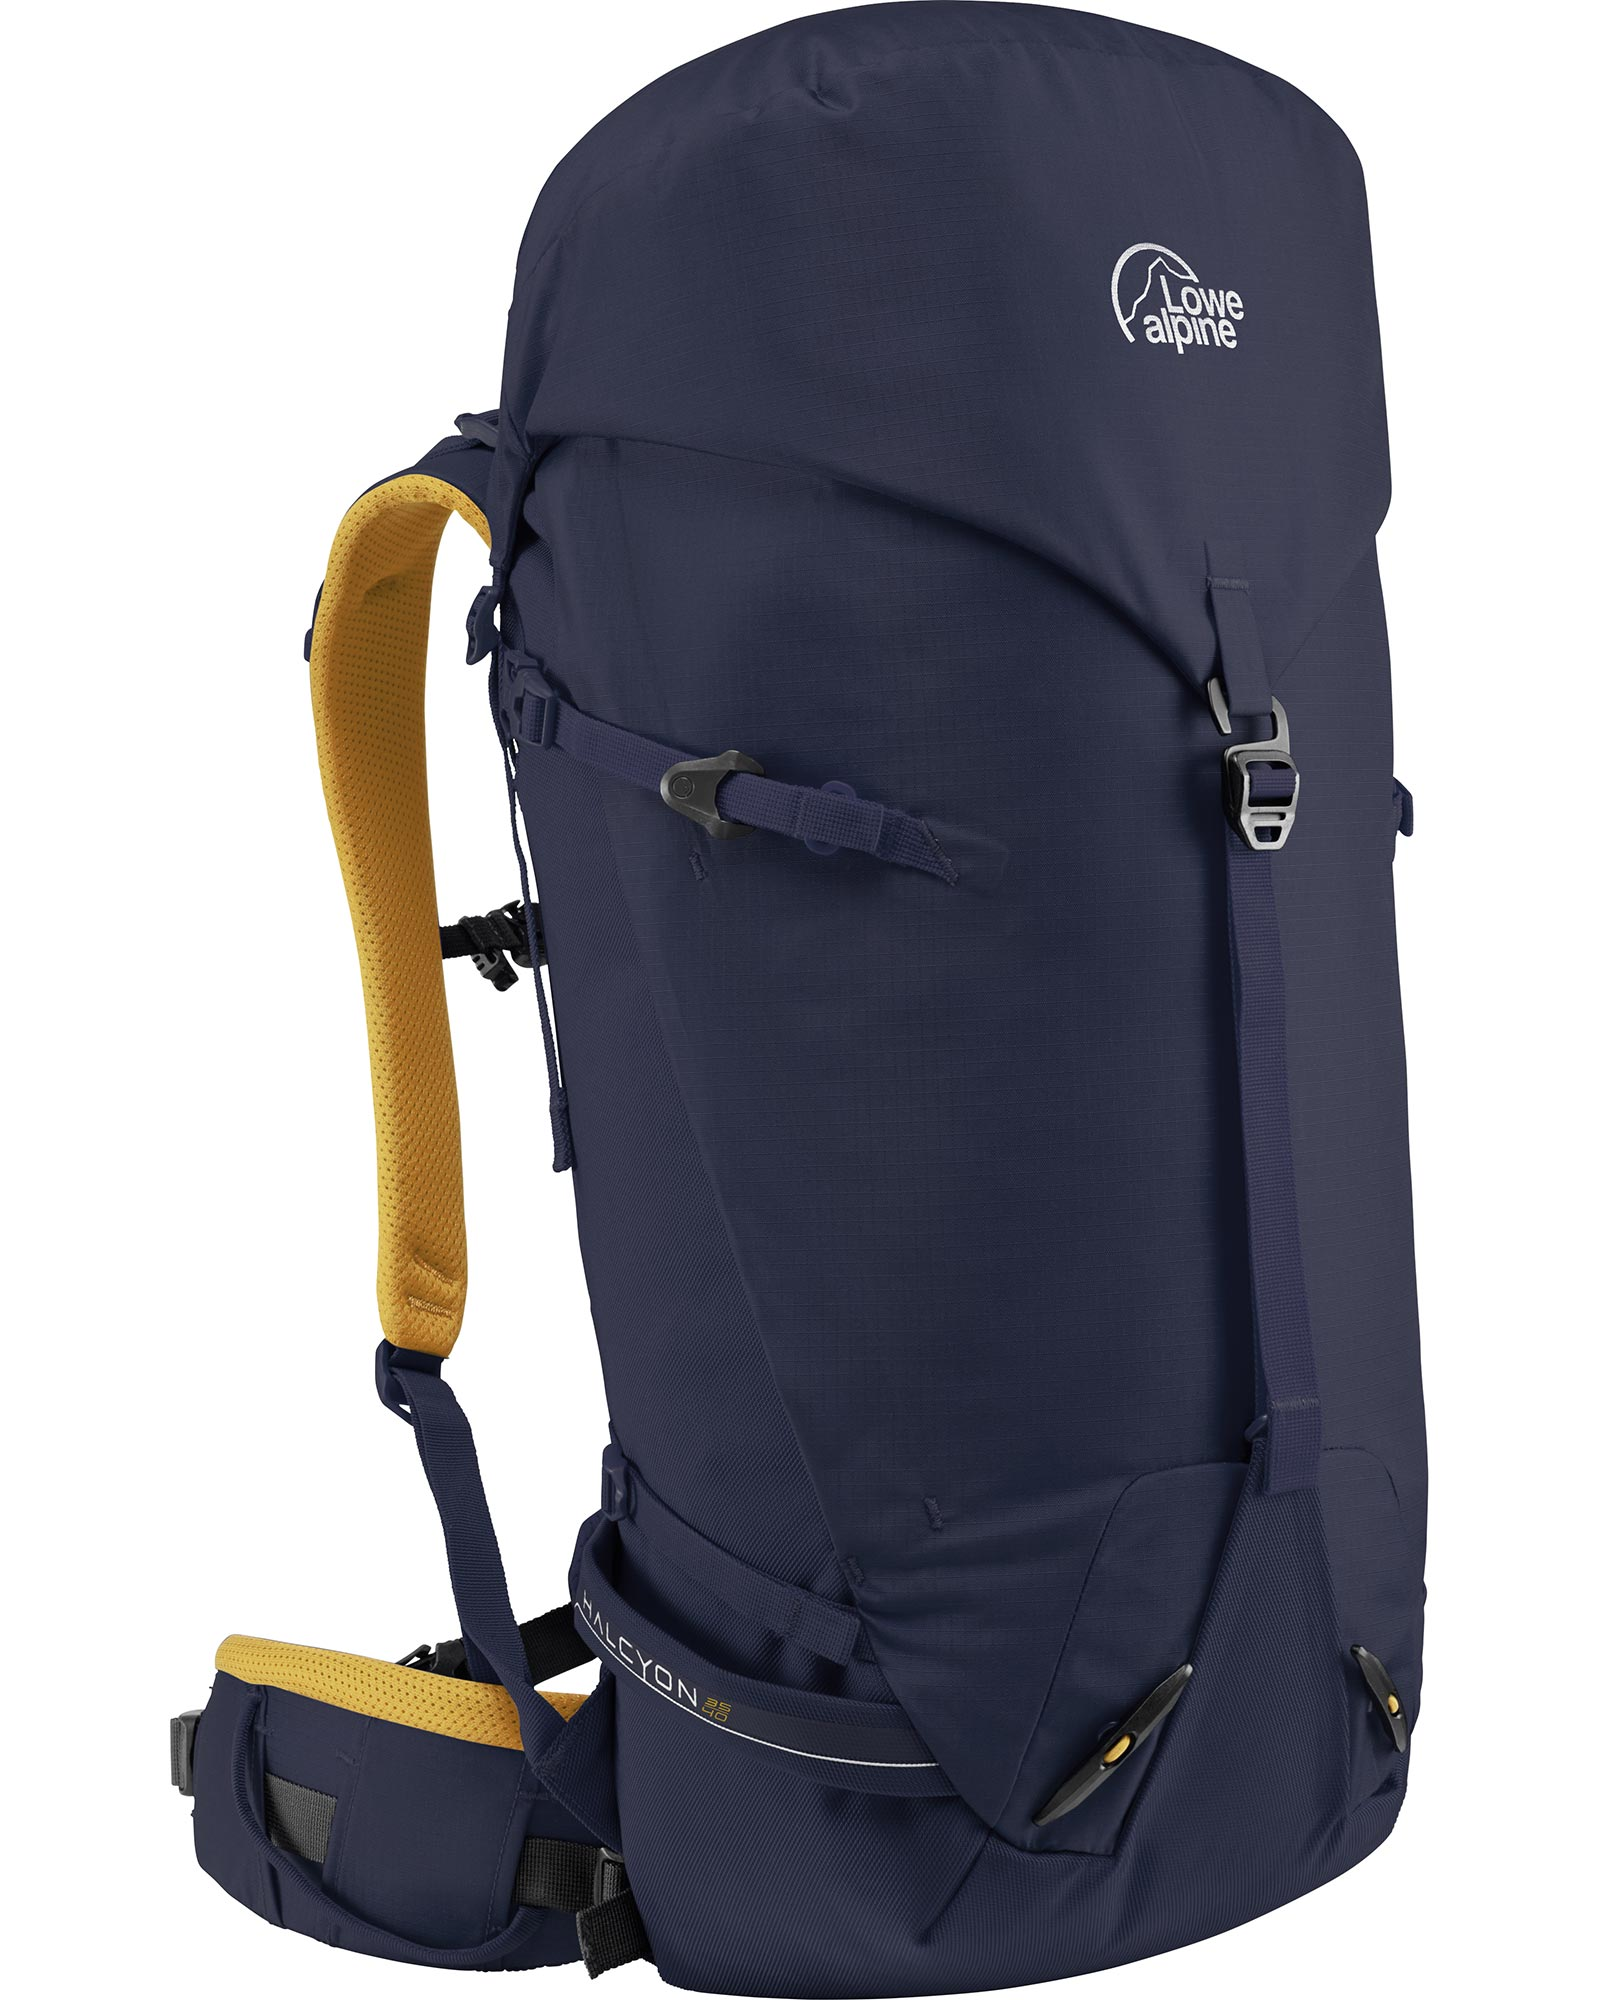 Lowe Alpine Halcyon 35:40 Backpack 0